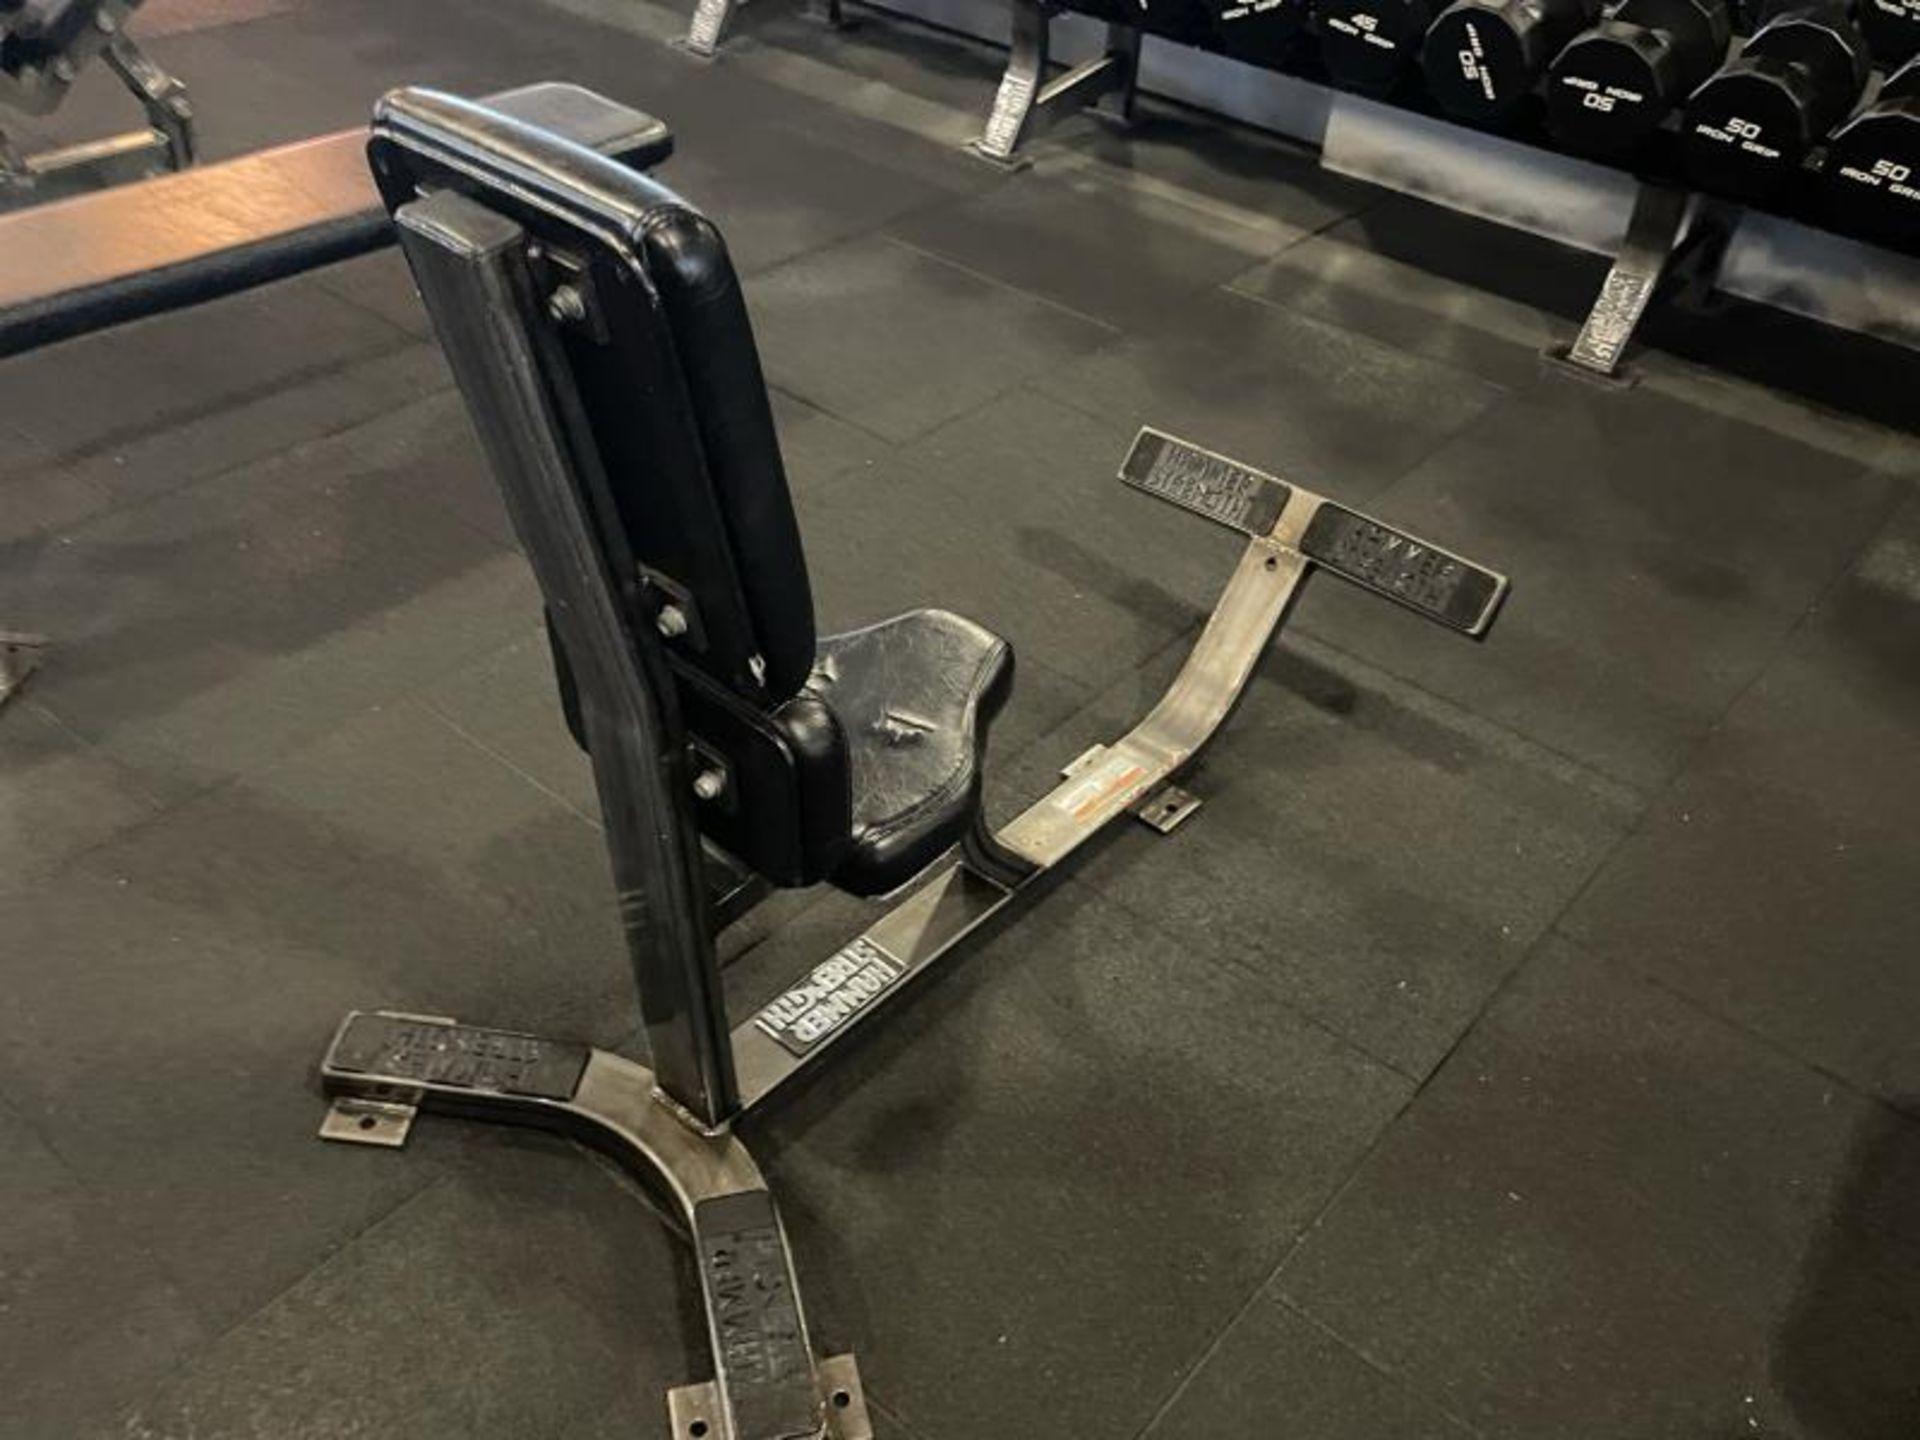 Hammer Strength Upright Bench - Image 2 of 2